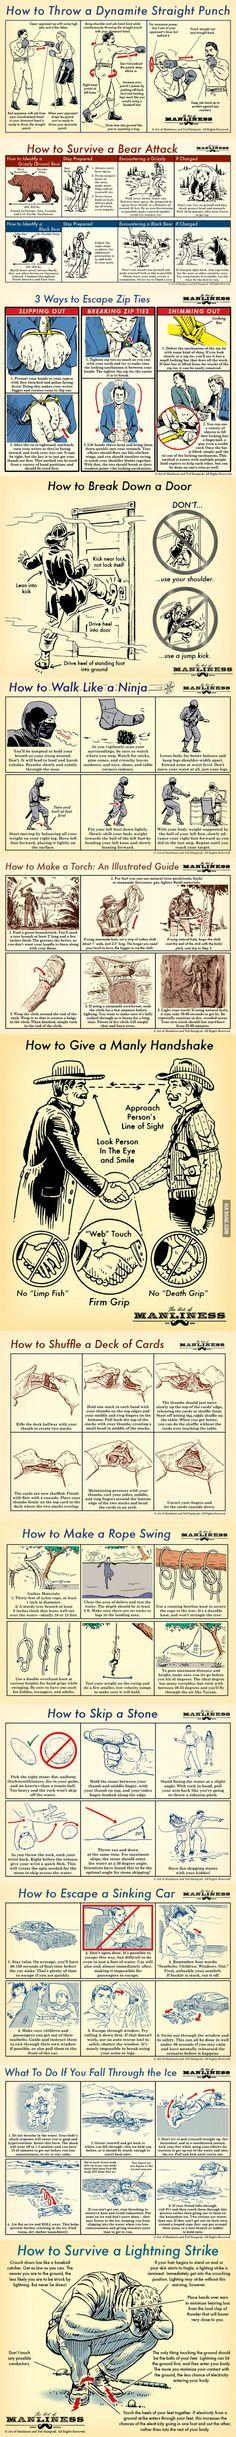 Manly Skills For Men Consejos De Supervivencia Habilidades De